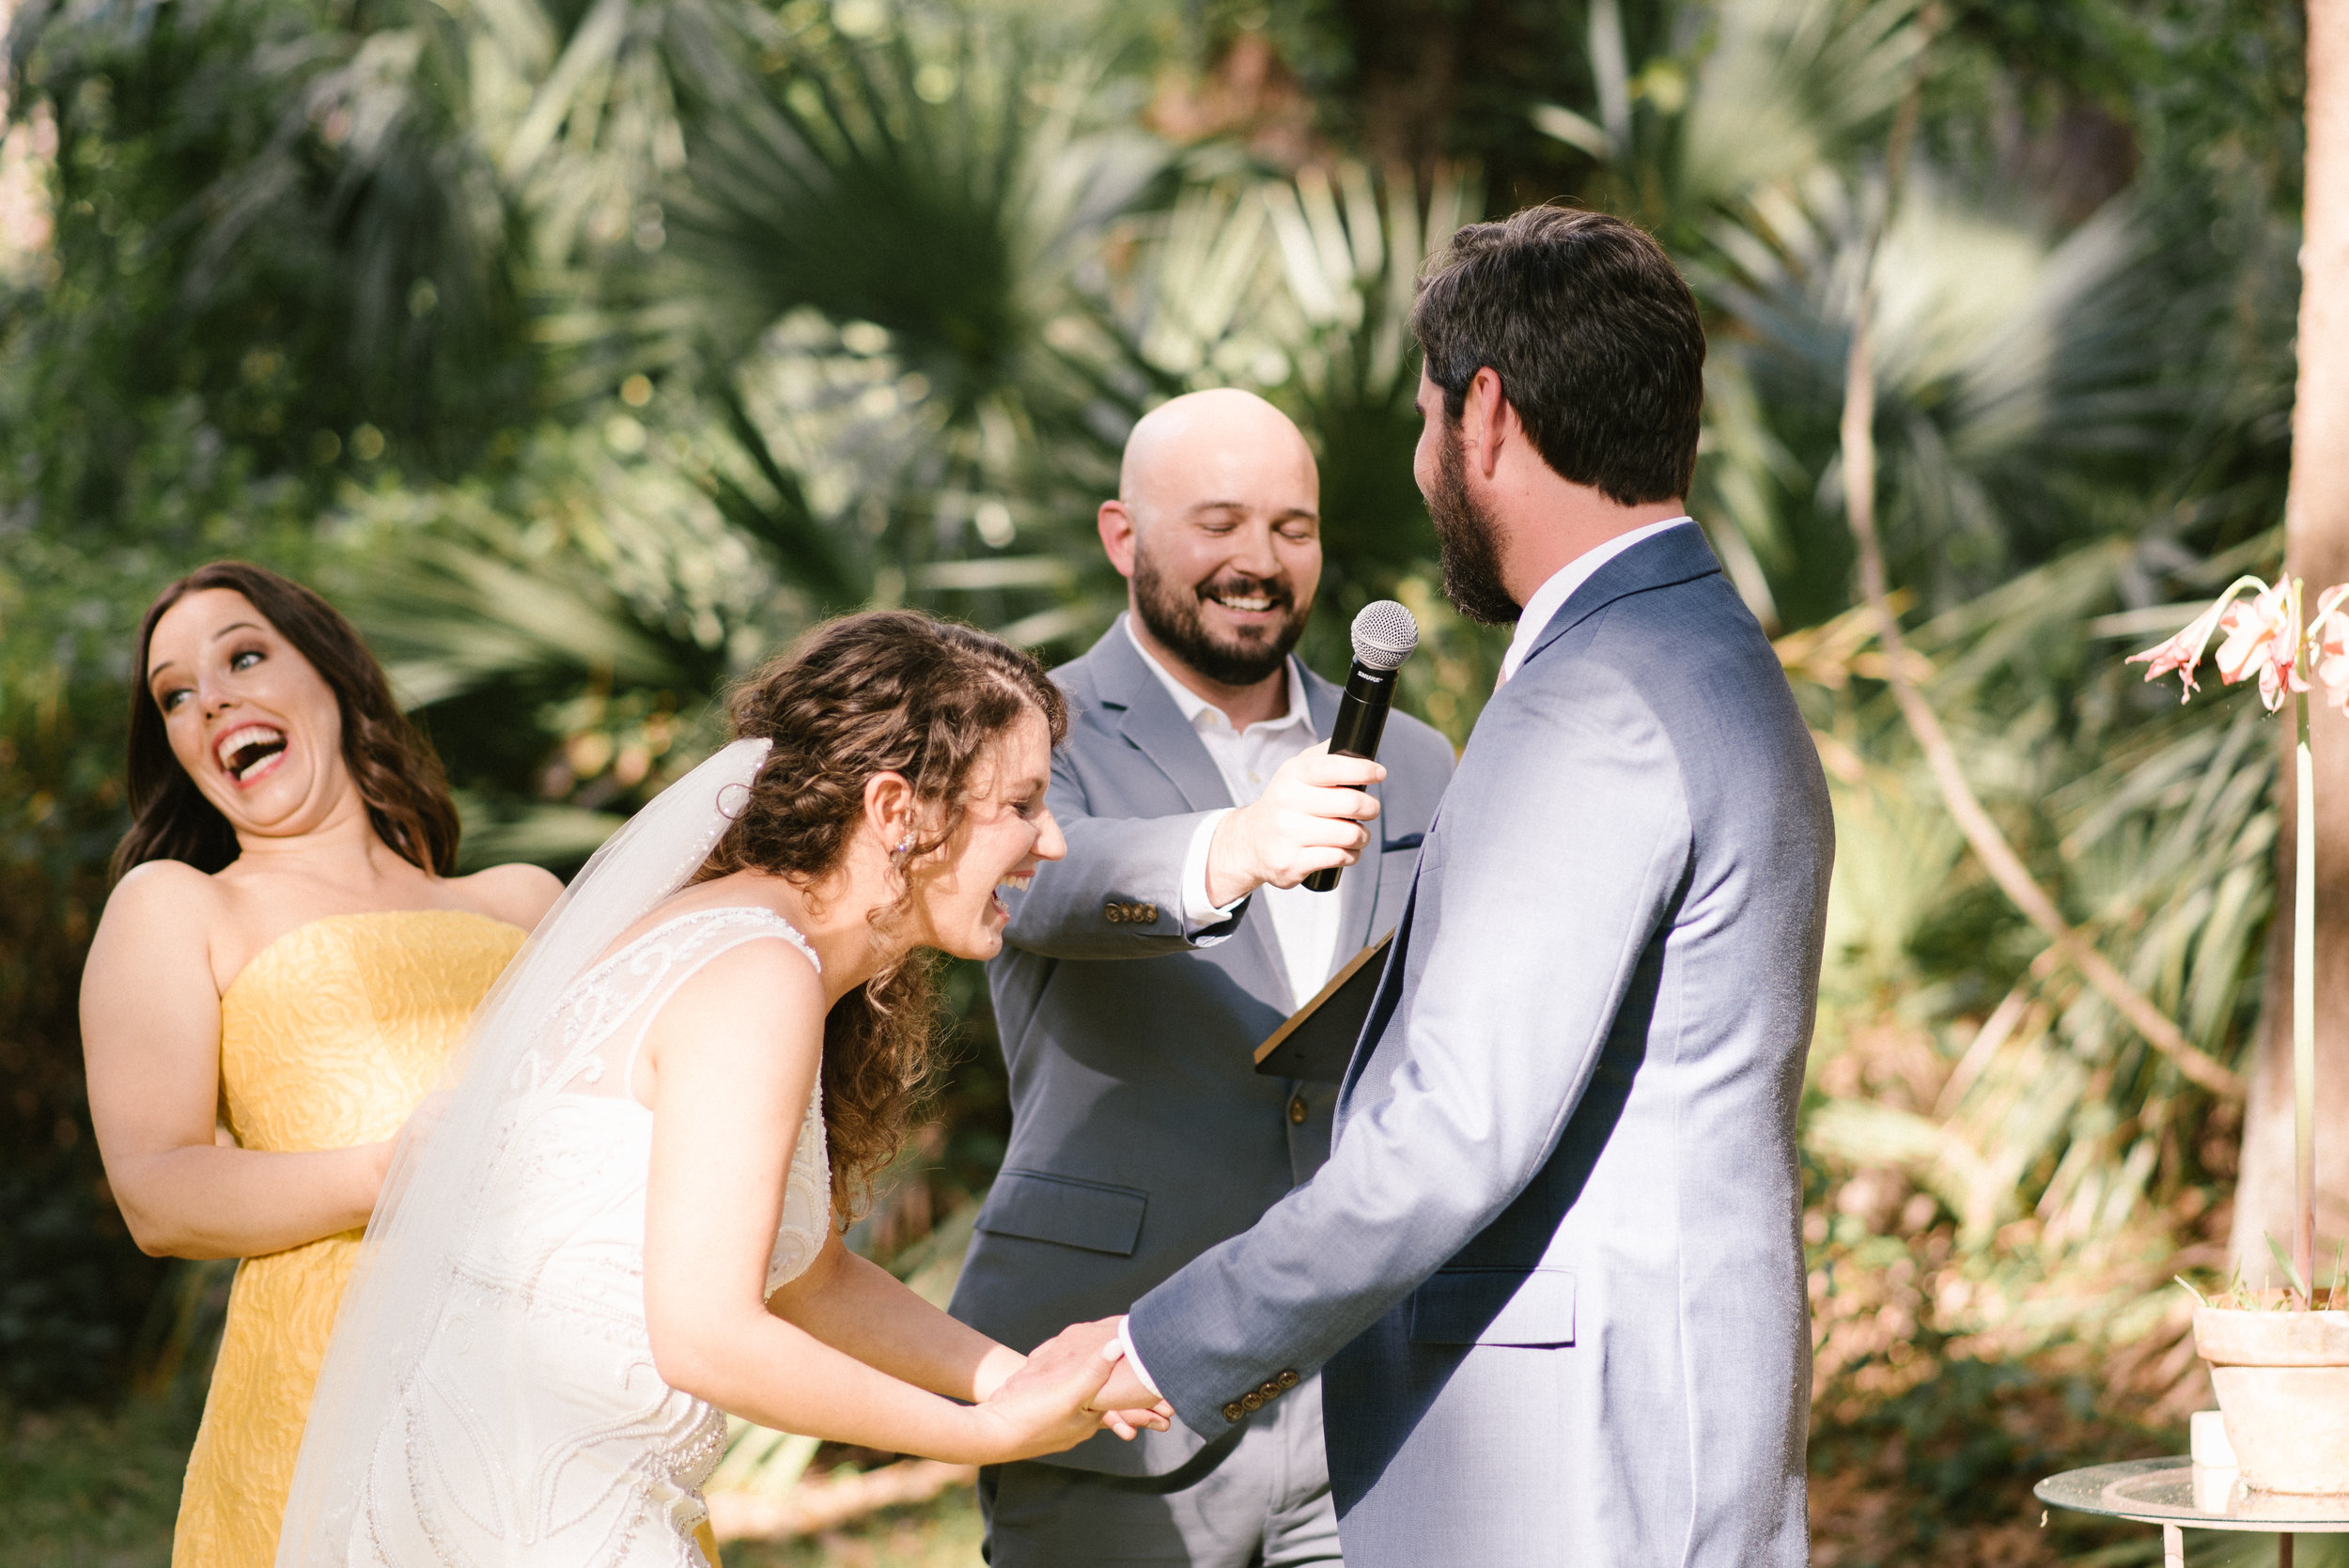 mclaughlin-wedding-492.jpg